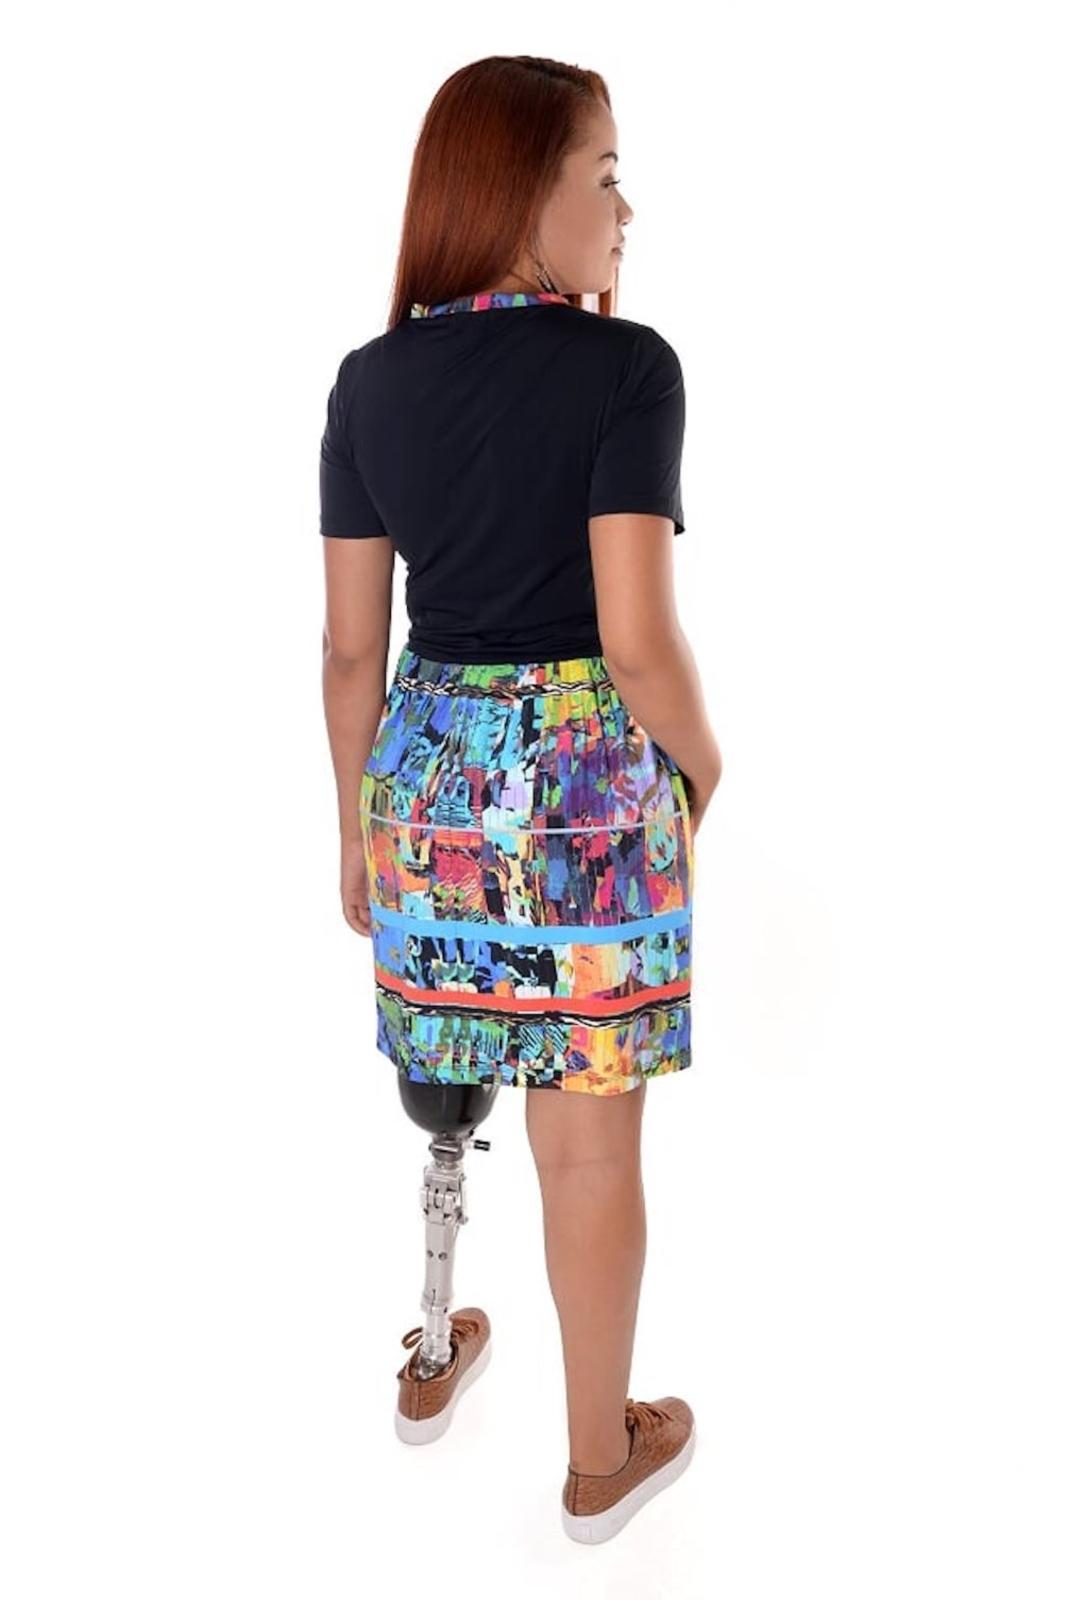 Vestido Equal Moda Inclusiva Mix